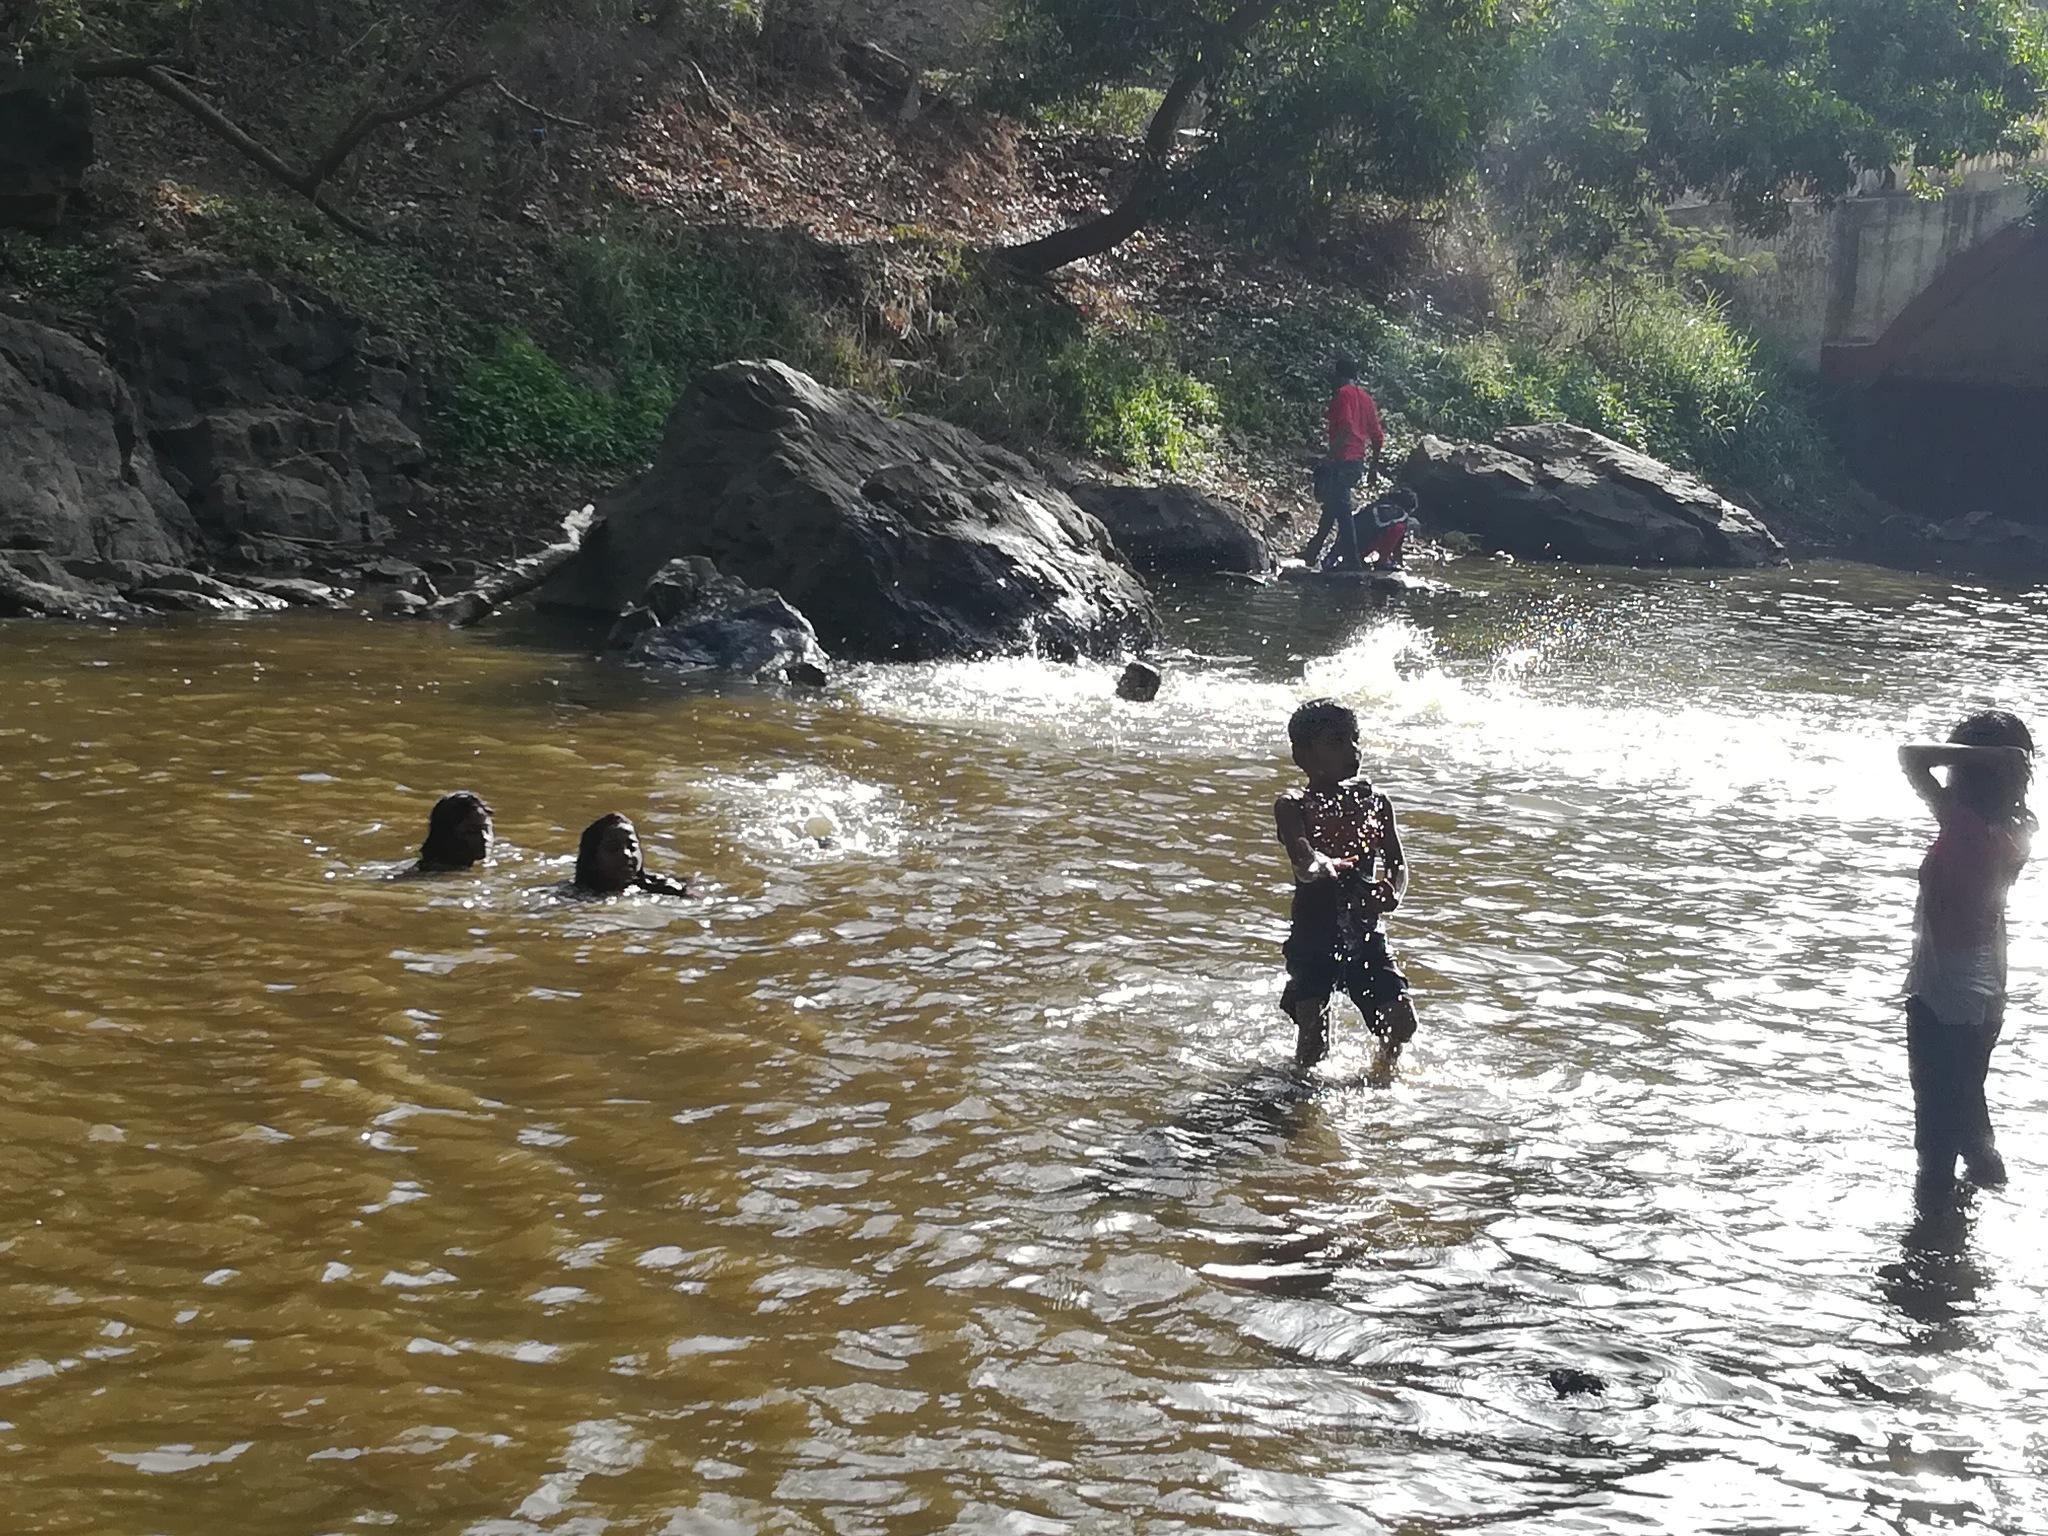 joy of nature's water park by ushapandya19